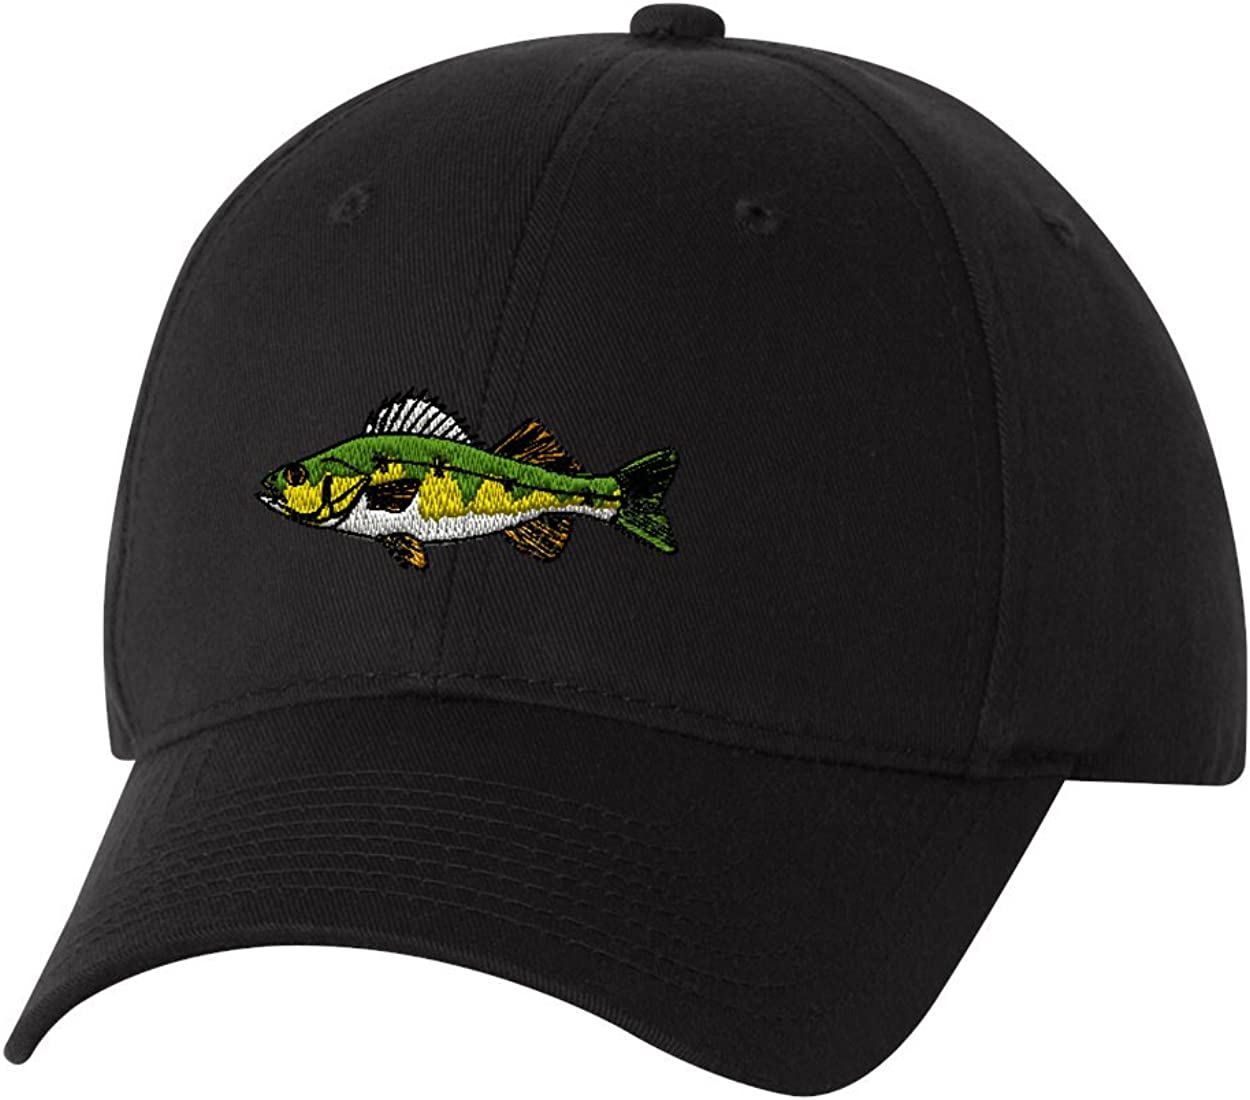 Zander Fishing   5 Panel Premium Baseball Cap